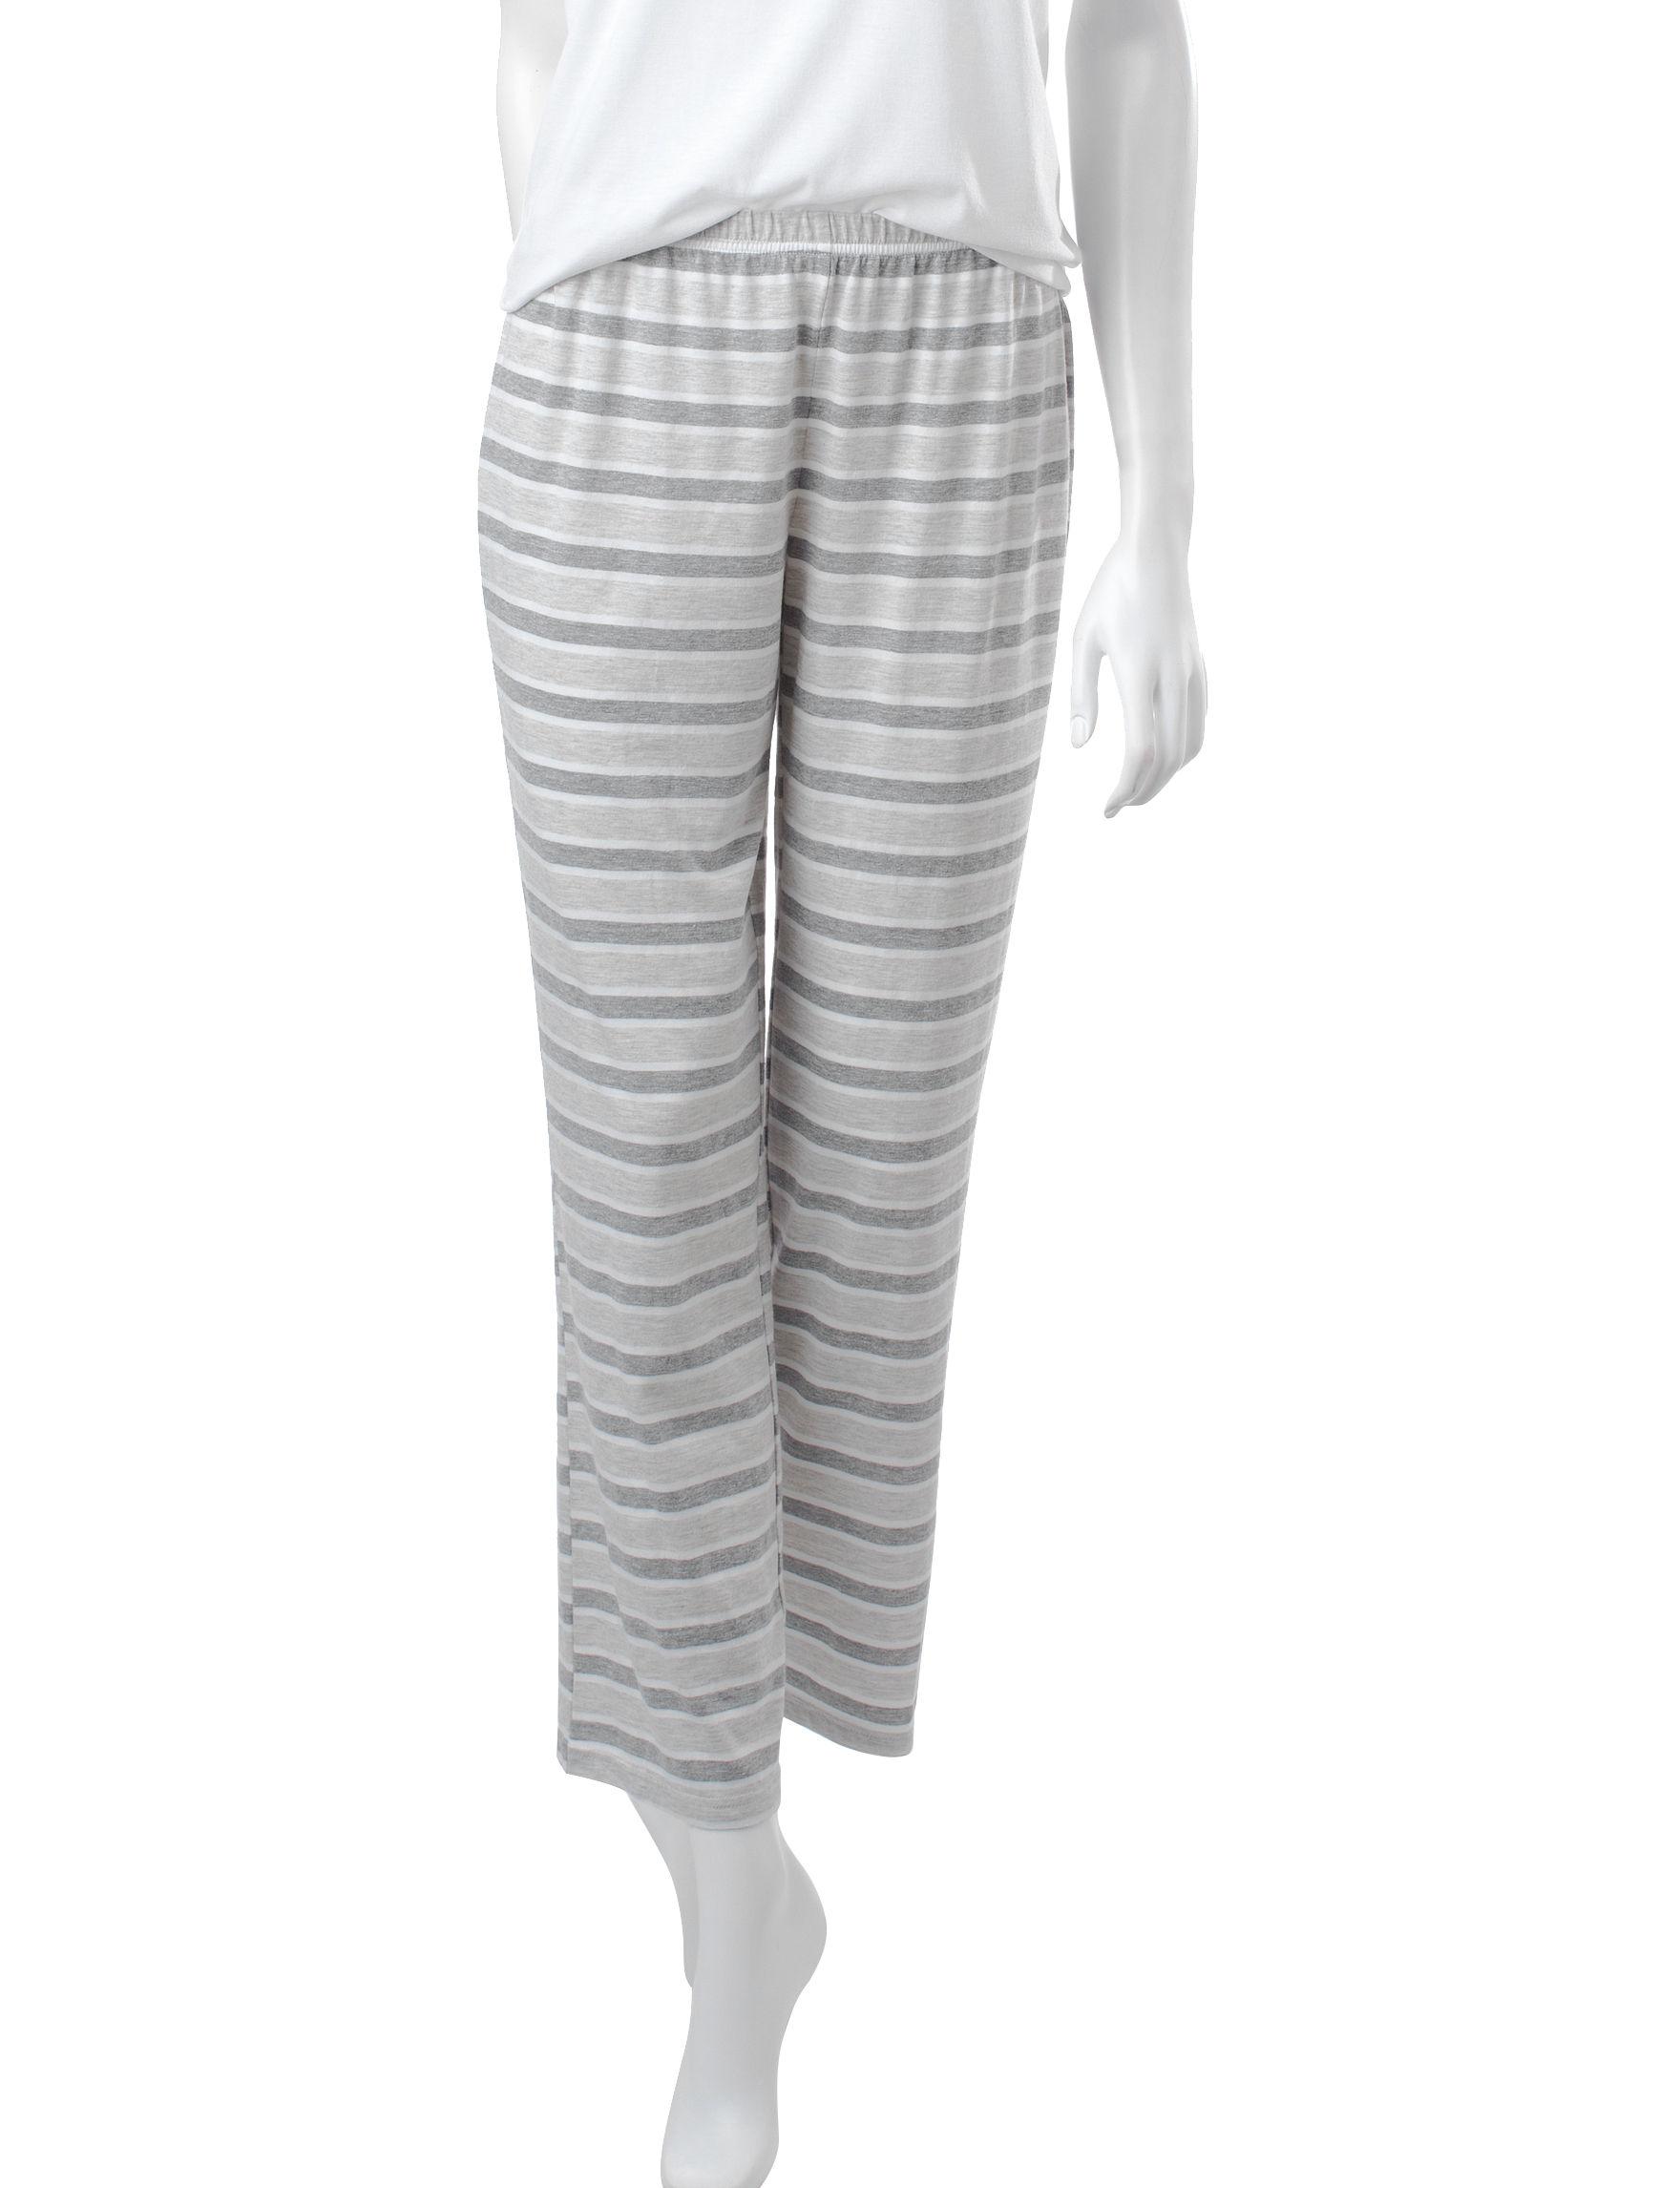 PJ Couture Oatmeal Pajama Bottoms